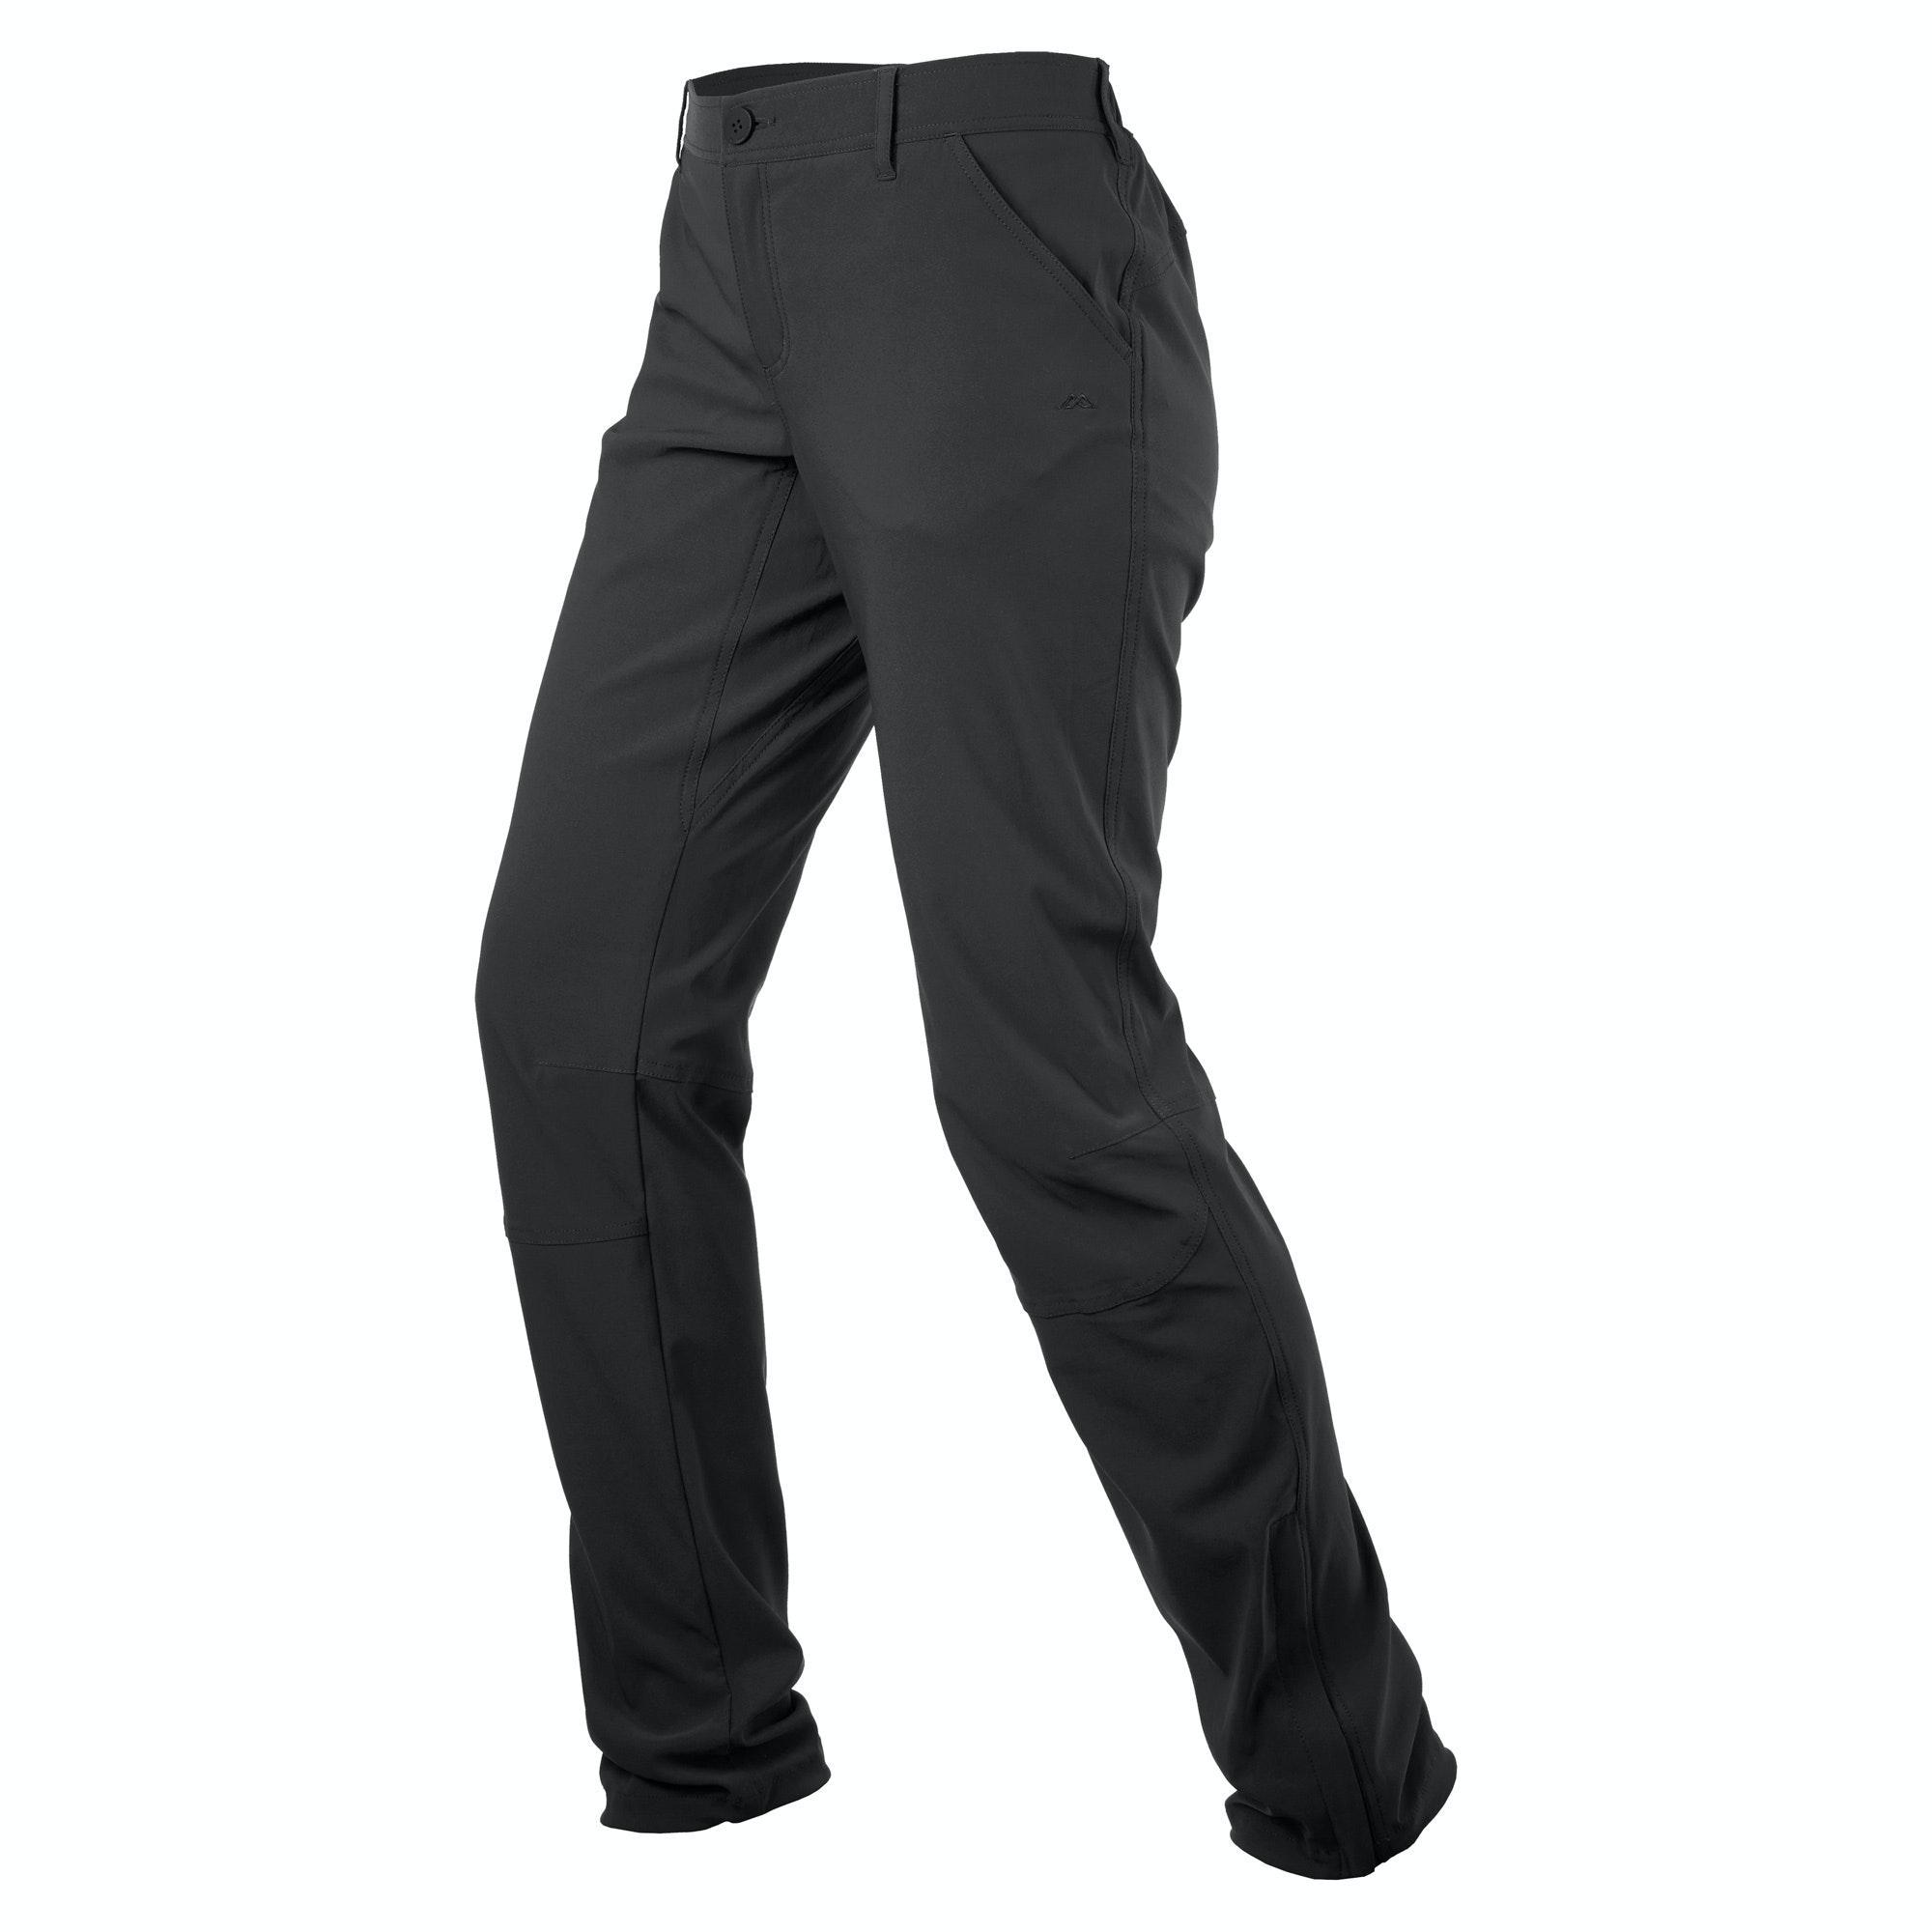 NEW-Kathmandu-Eris-Women-039-s-Softshell-Hiking-Pants-Trousers-v2-Zip-Hem-Over-Boots thumbnail 6